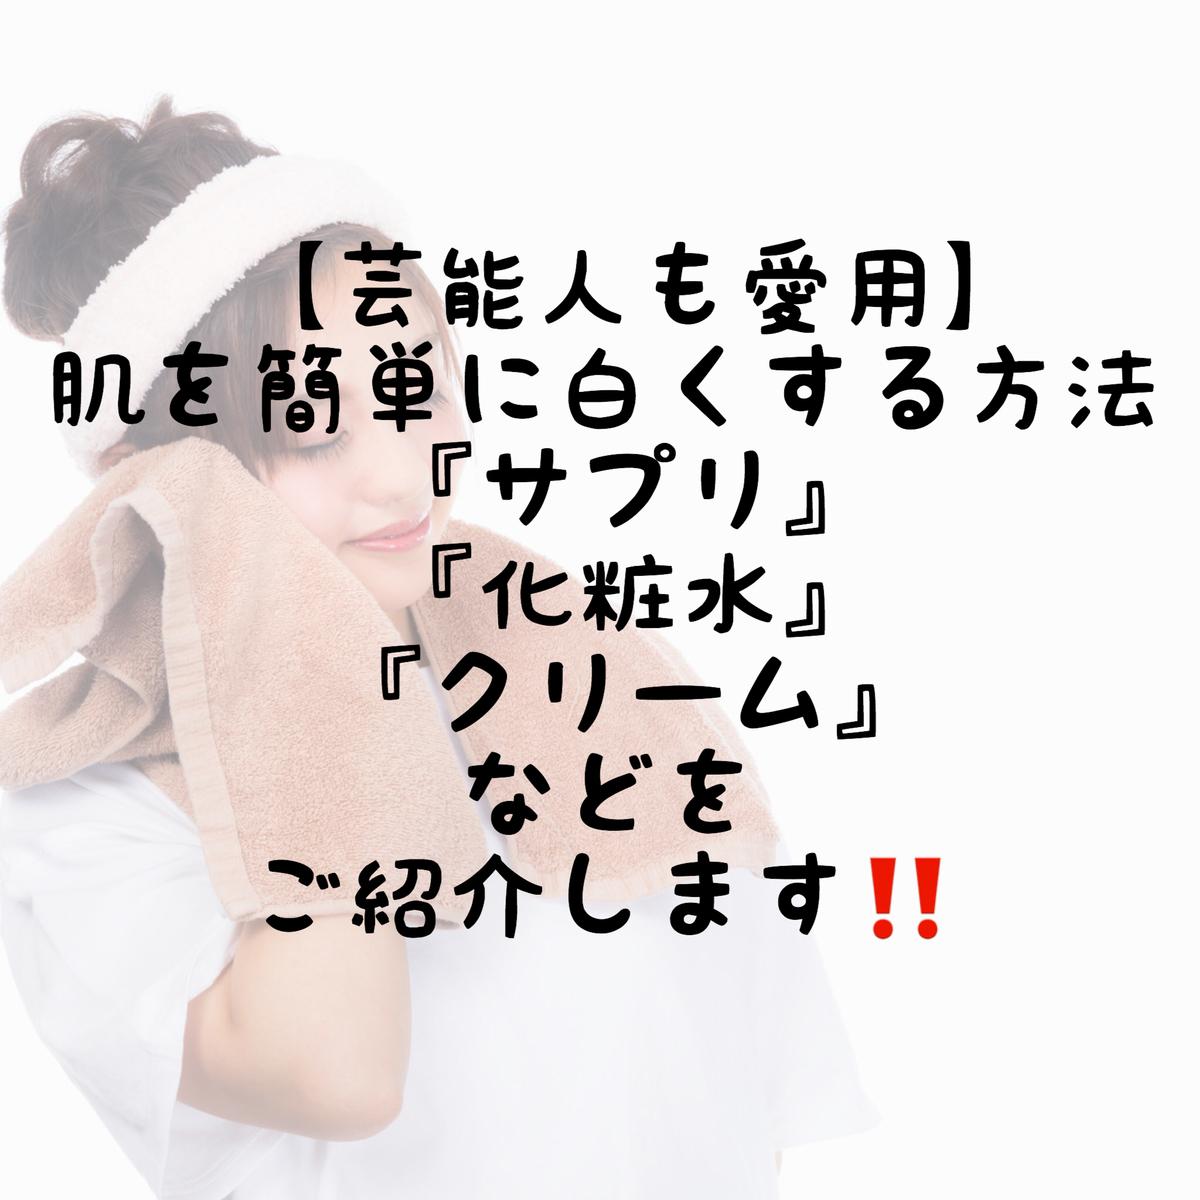 f:id:nokonoko_o:20200702180156j:plain